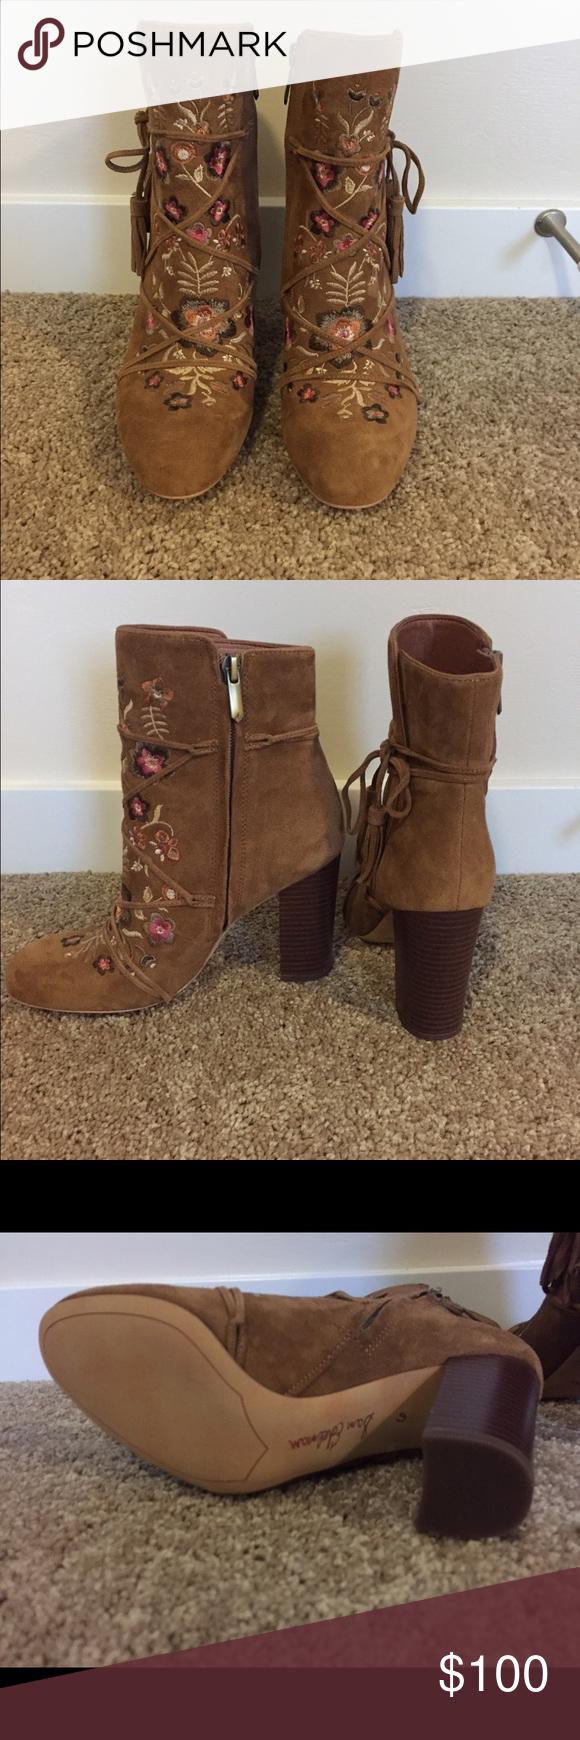 48a04cd14 Sam Edelman Winnie boots size 6 Brand new with box Sam Edelman Winnie boots.  Size